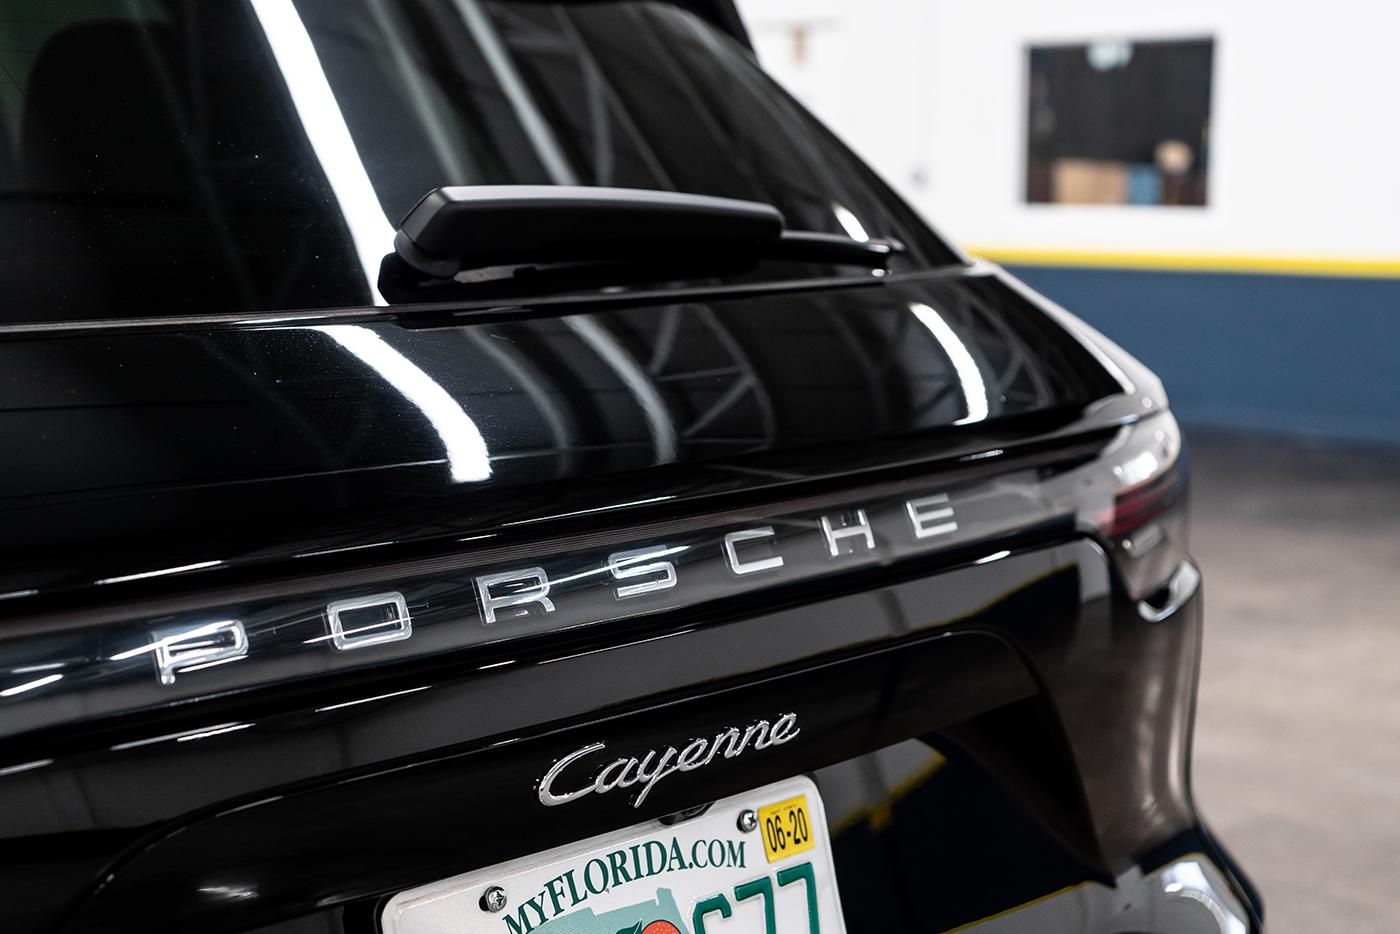 Porsche-Cayenne-_-Website4.jpg